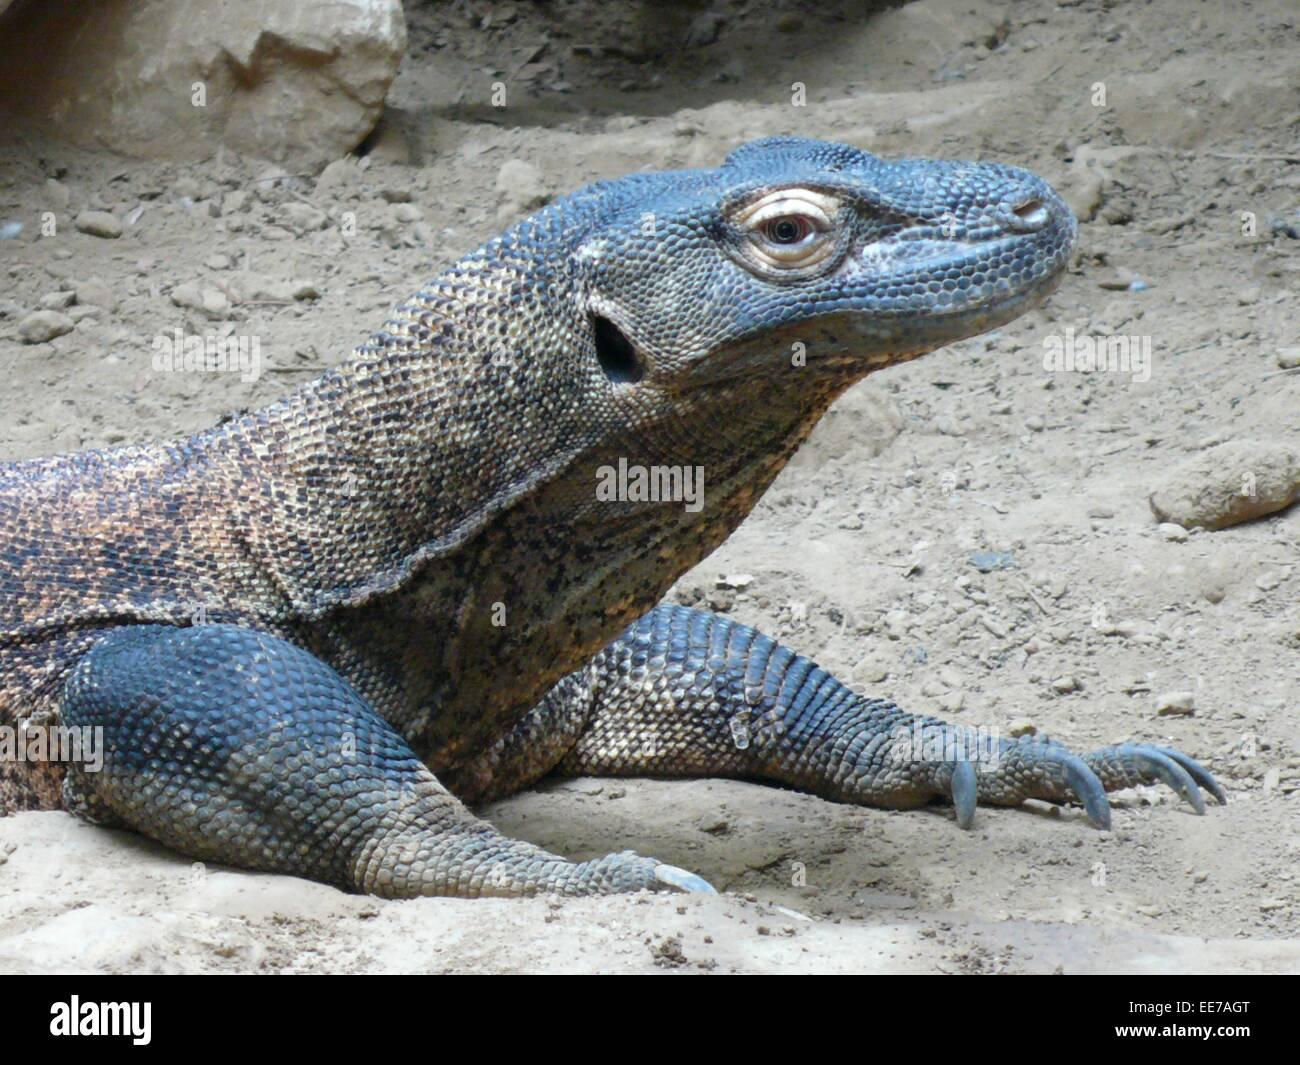 Crocodile Monitor Stock Photos & Crocodile Monitor Stock Images - Alamy